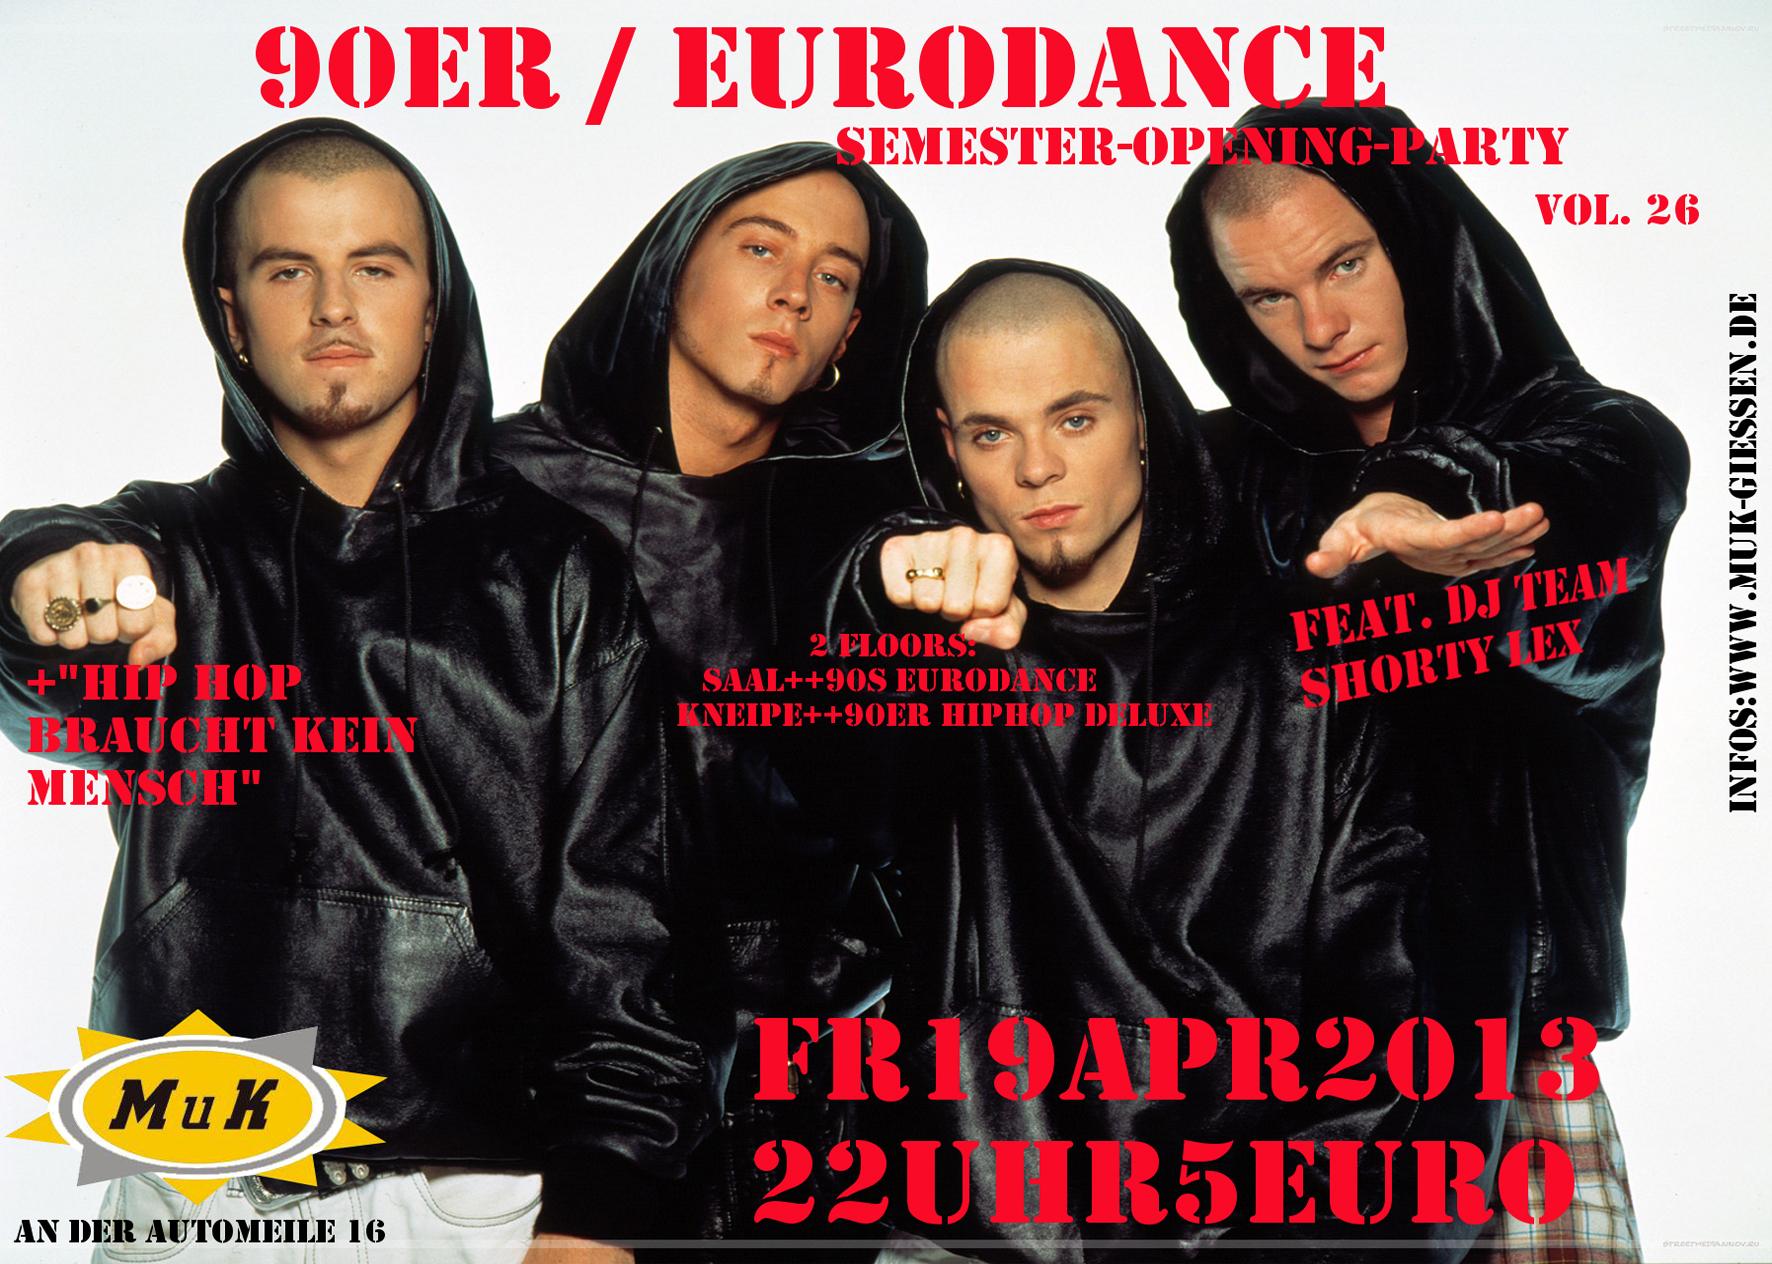 Party: 90er Eurodance & HipHop braucht kein Mensch